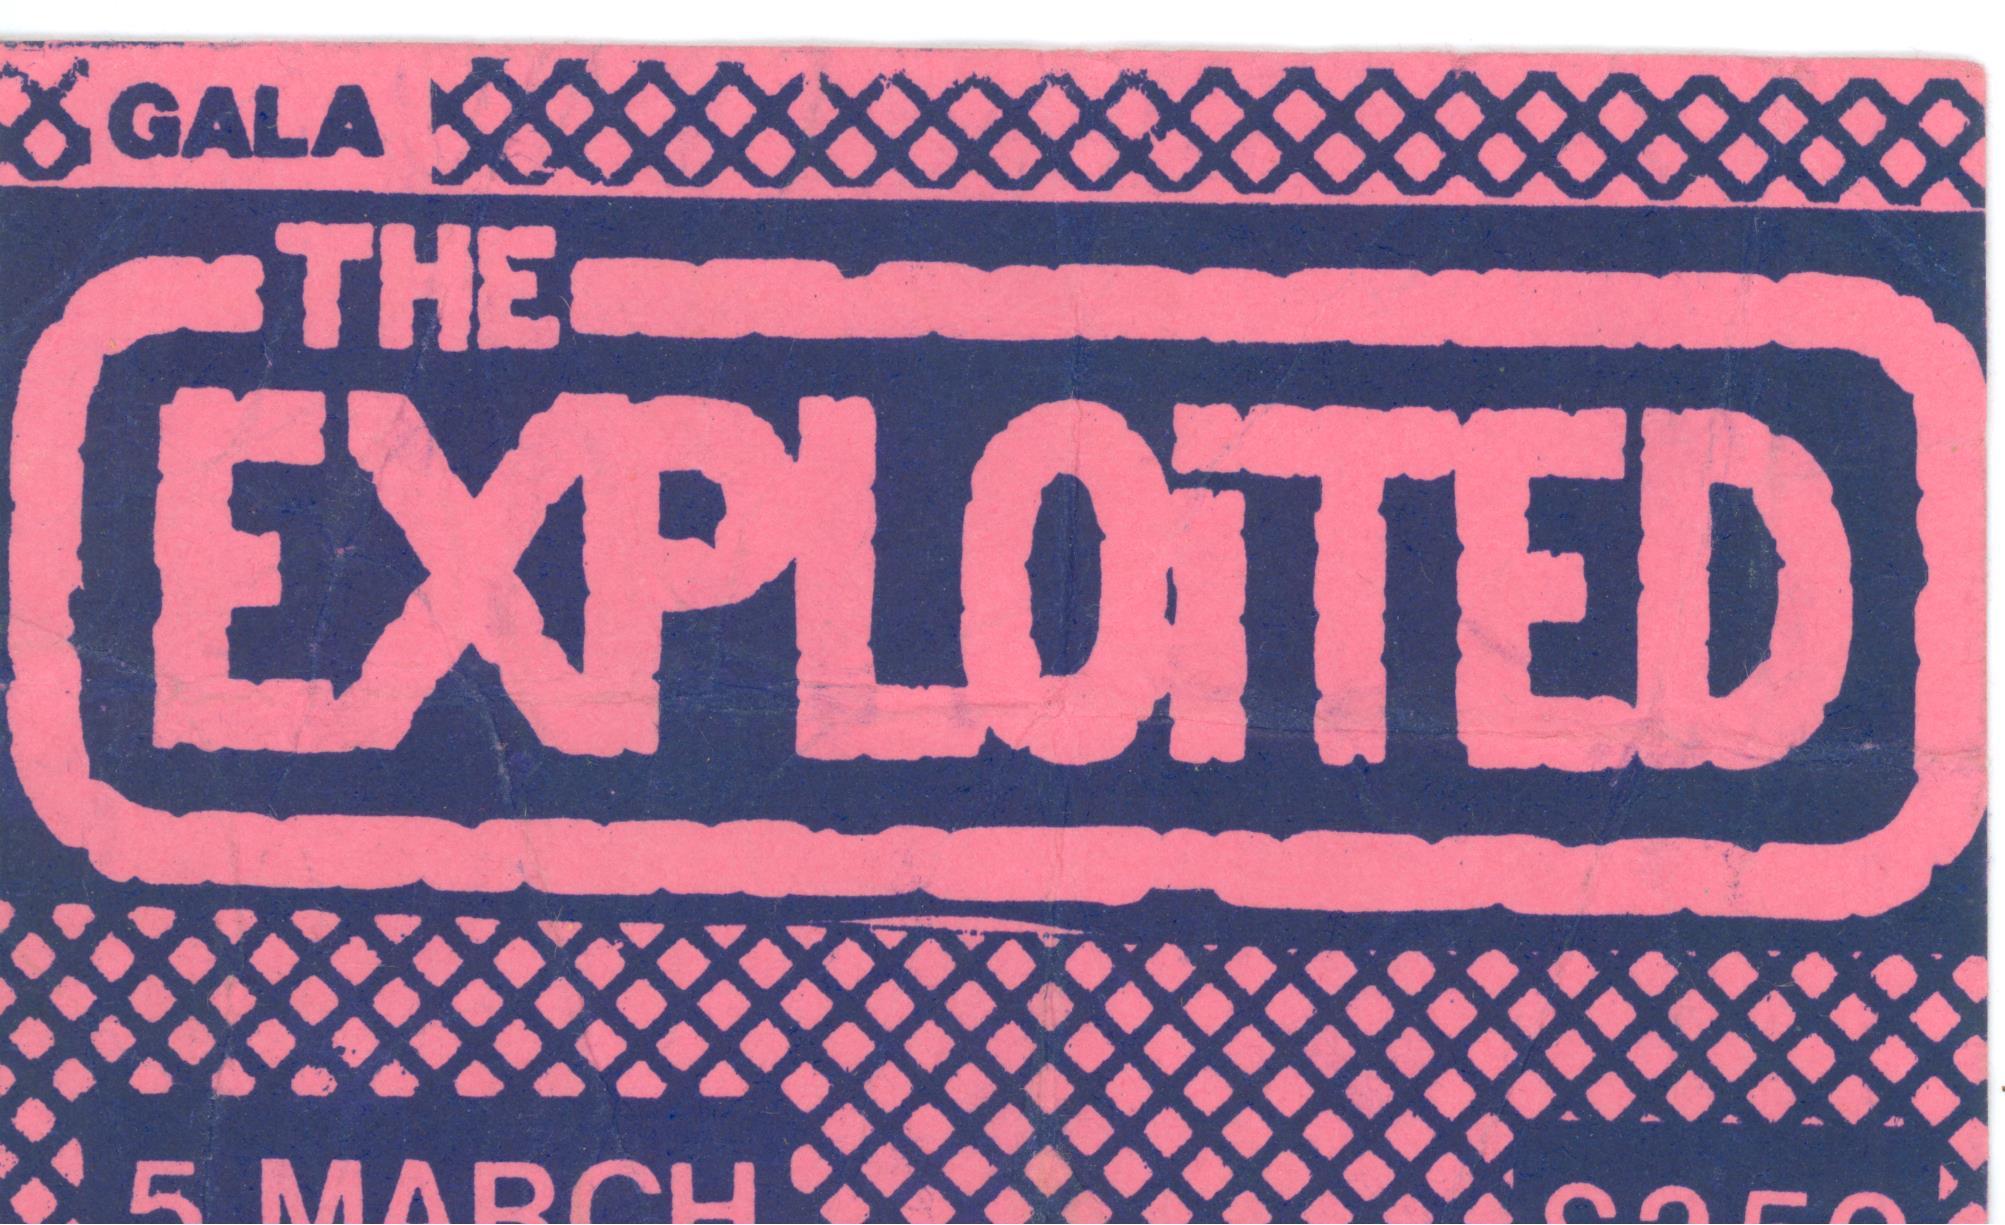 The Exploited, Gala Ballroom